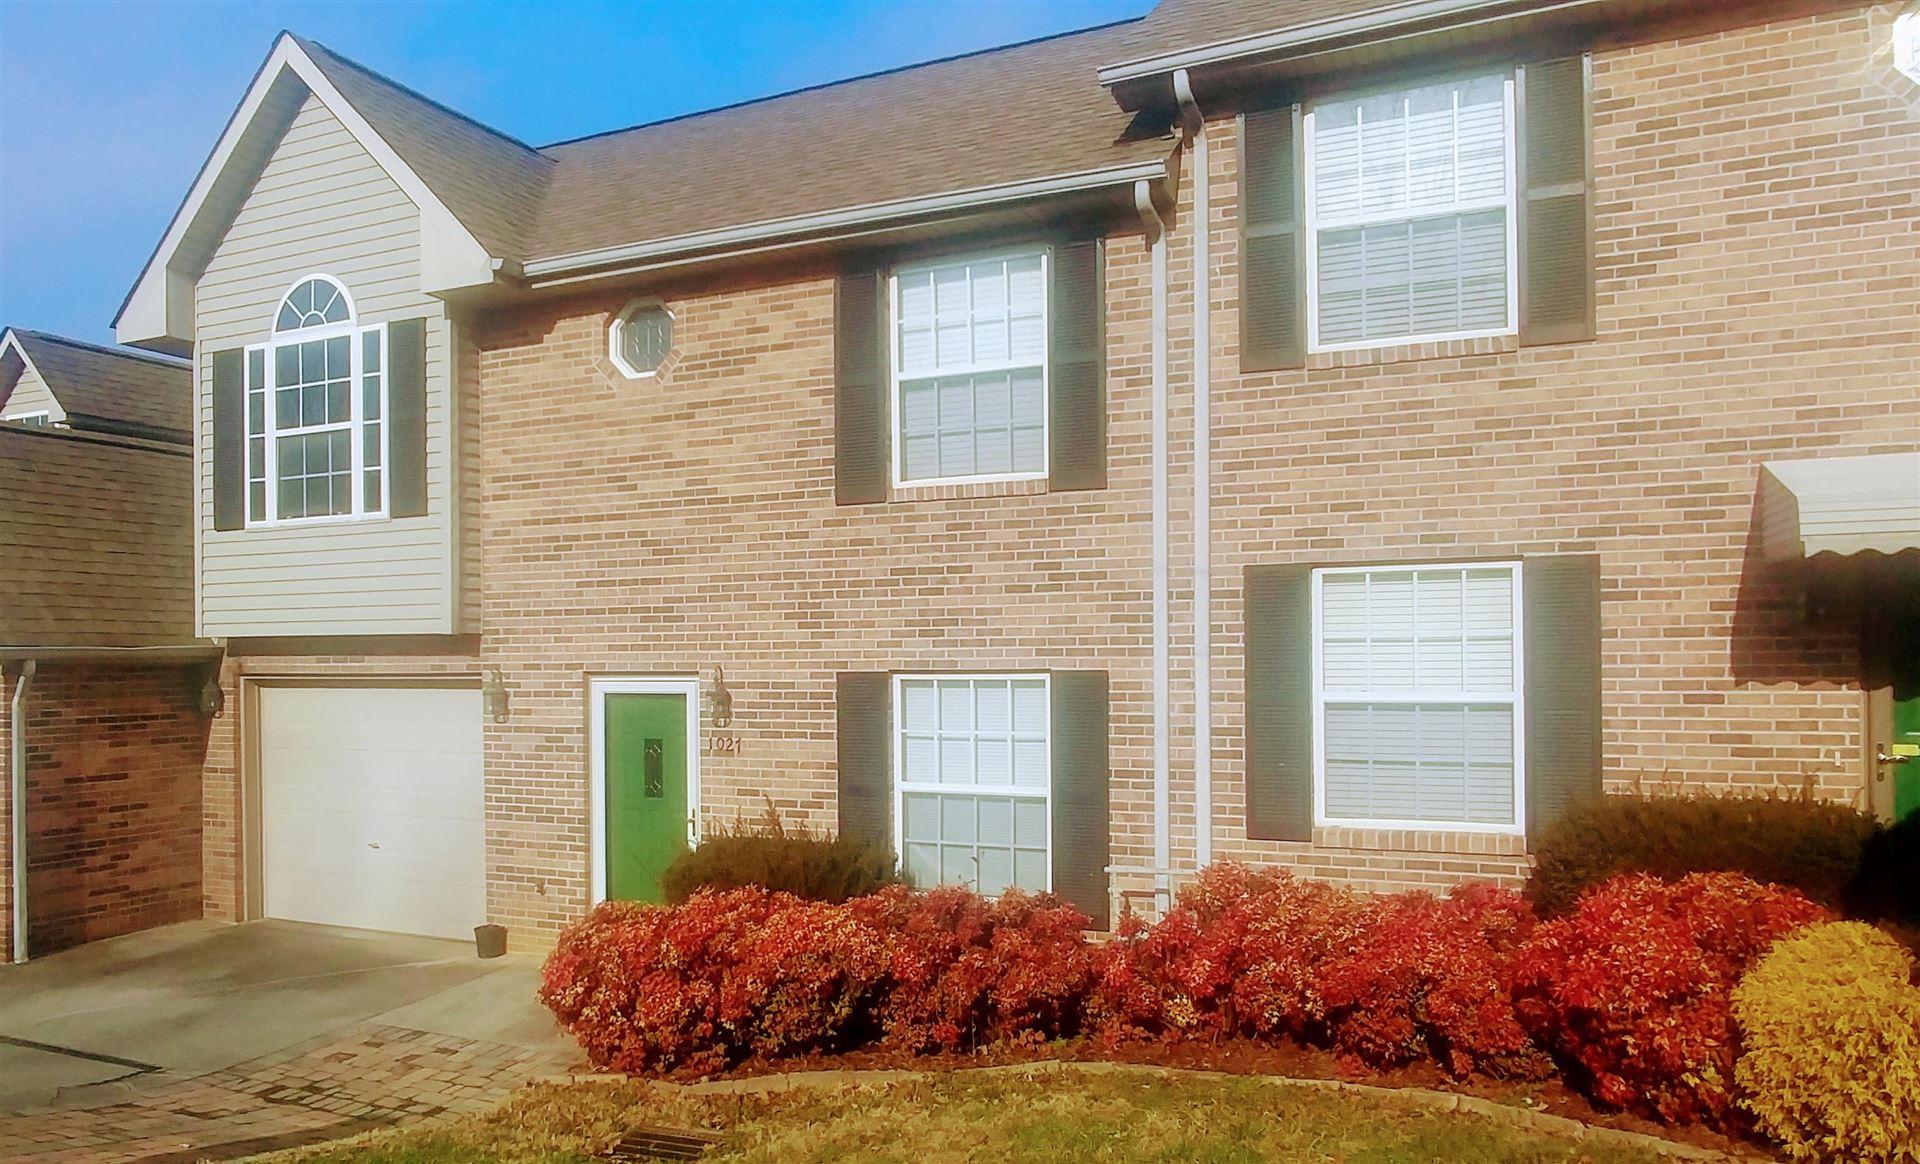 Photo of 1027 Silver Creek Lane, Maryville, TN 37804 (MLS # 1140173)